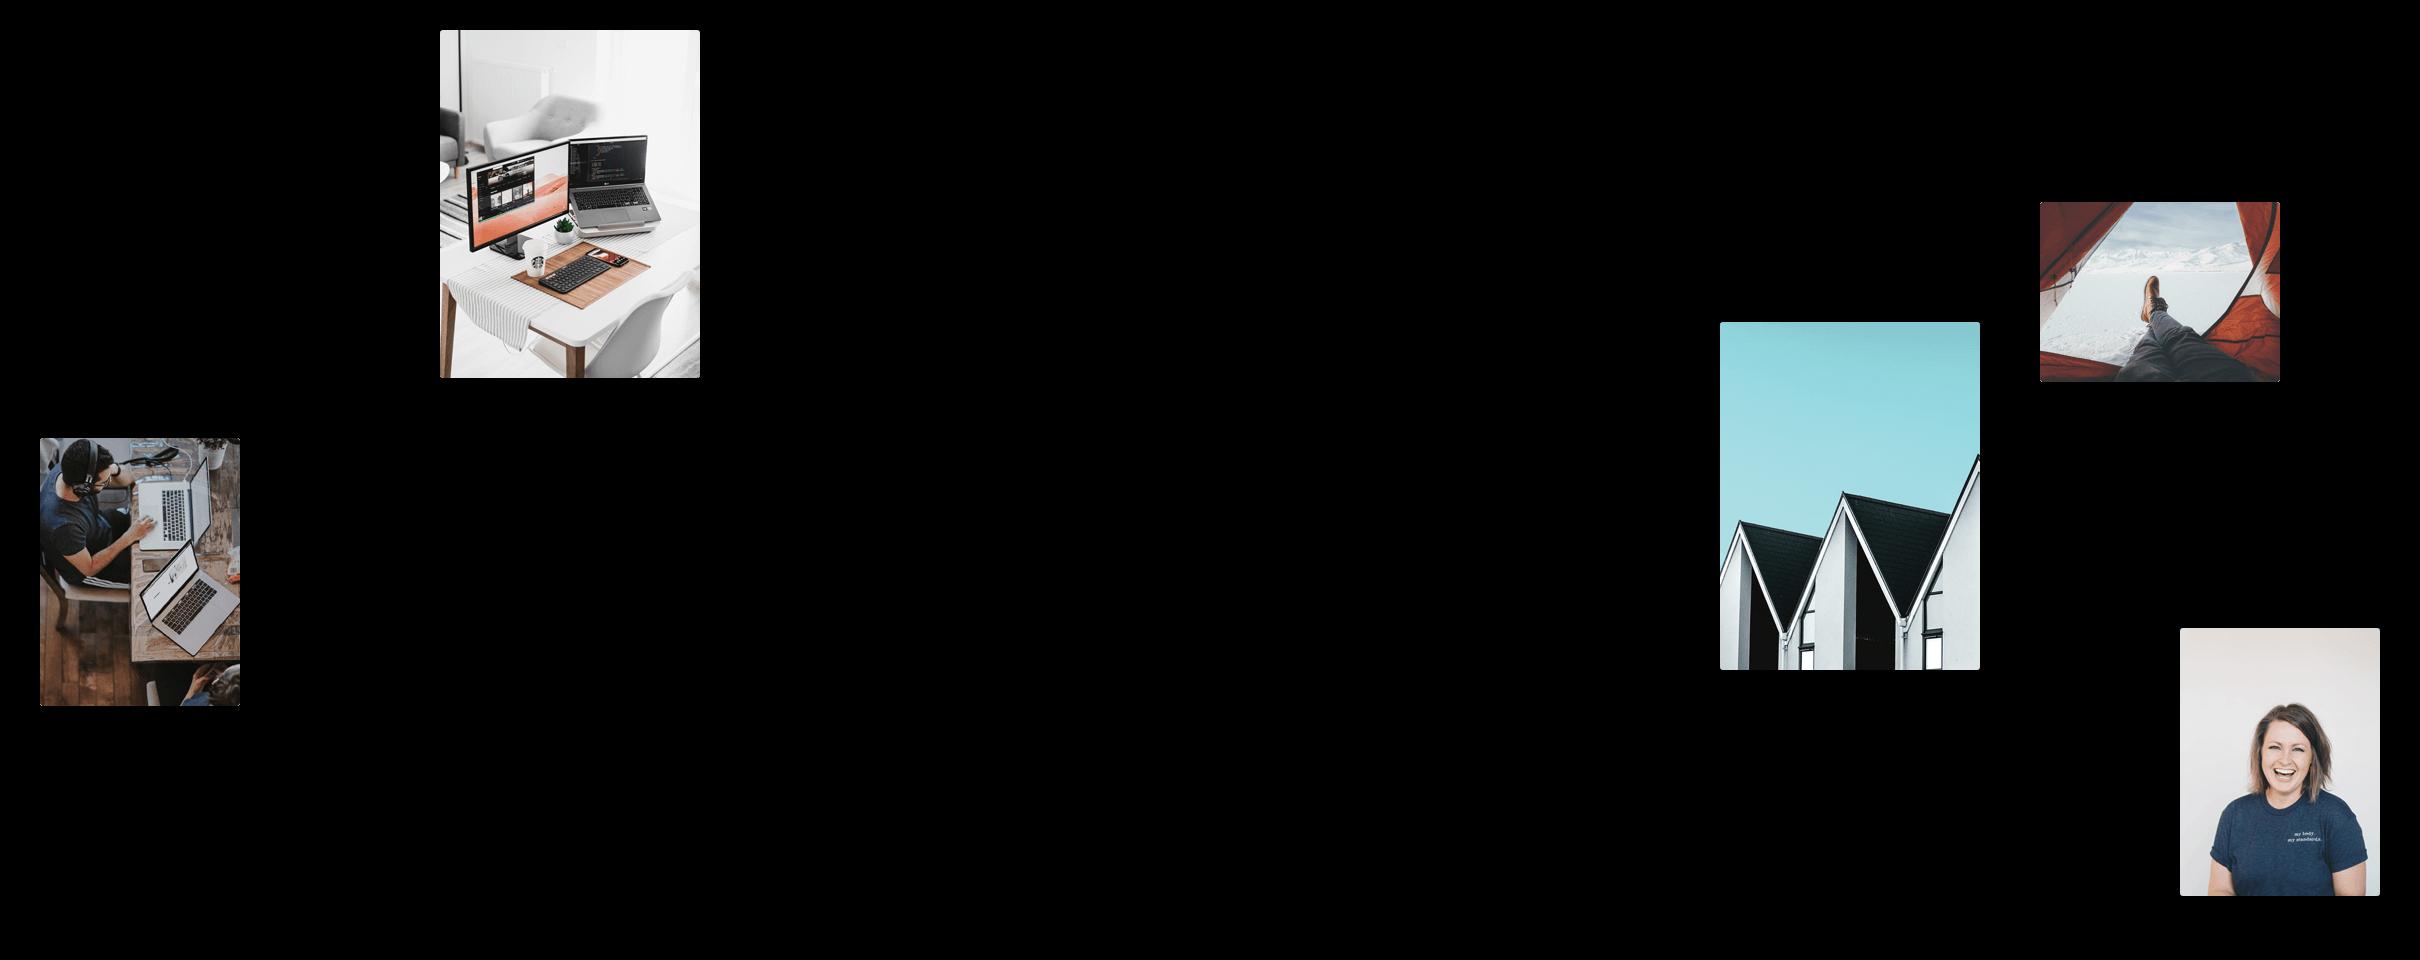 bg-41